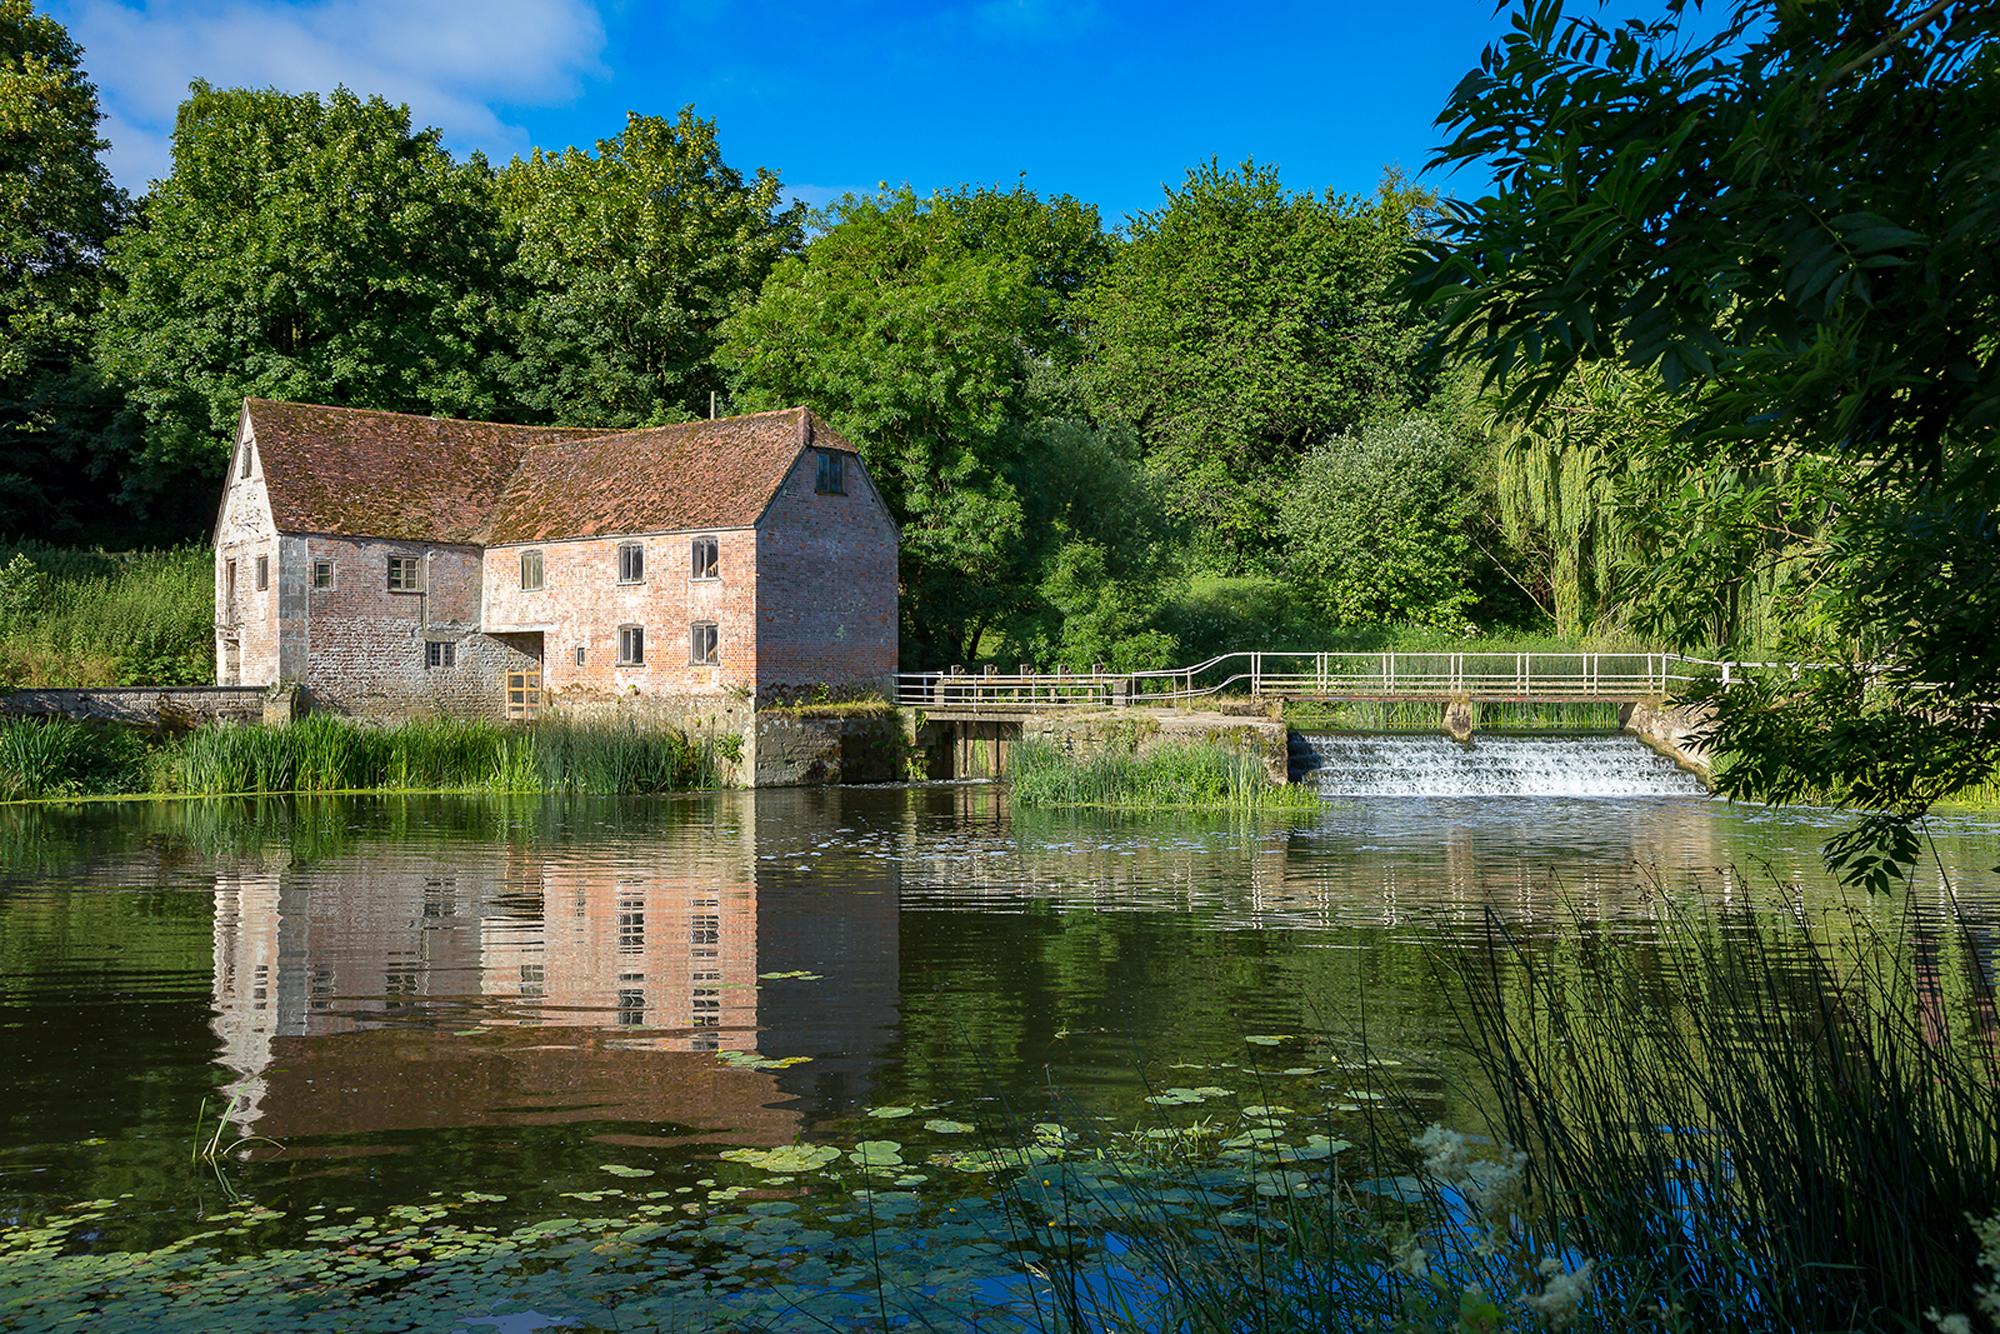 Sturminster Newton Mill sits on the River Stour